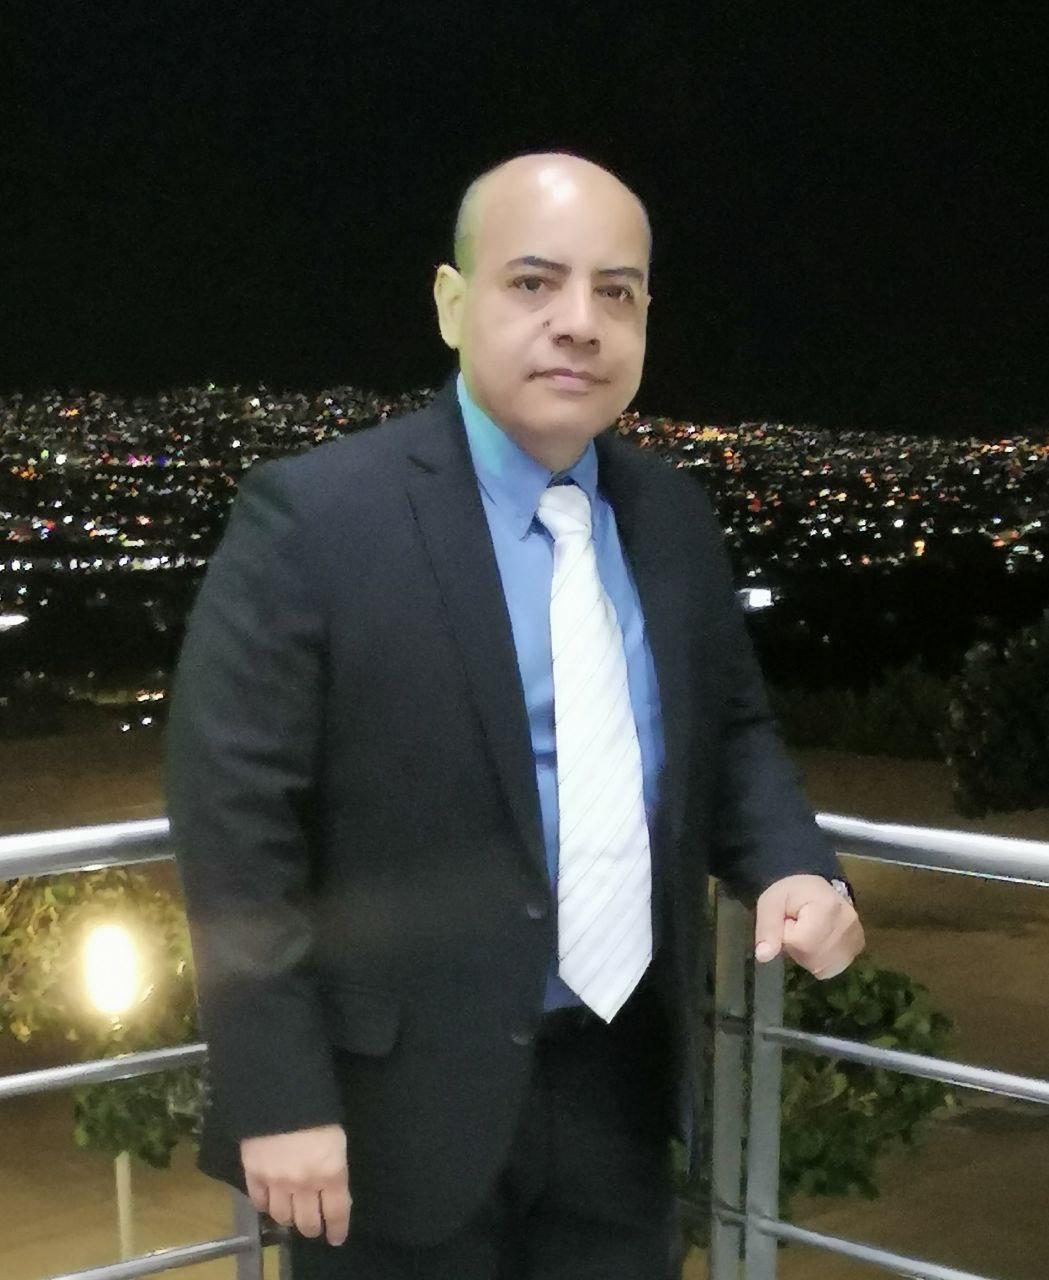 Dr. Guillermo Hernandez M.